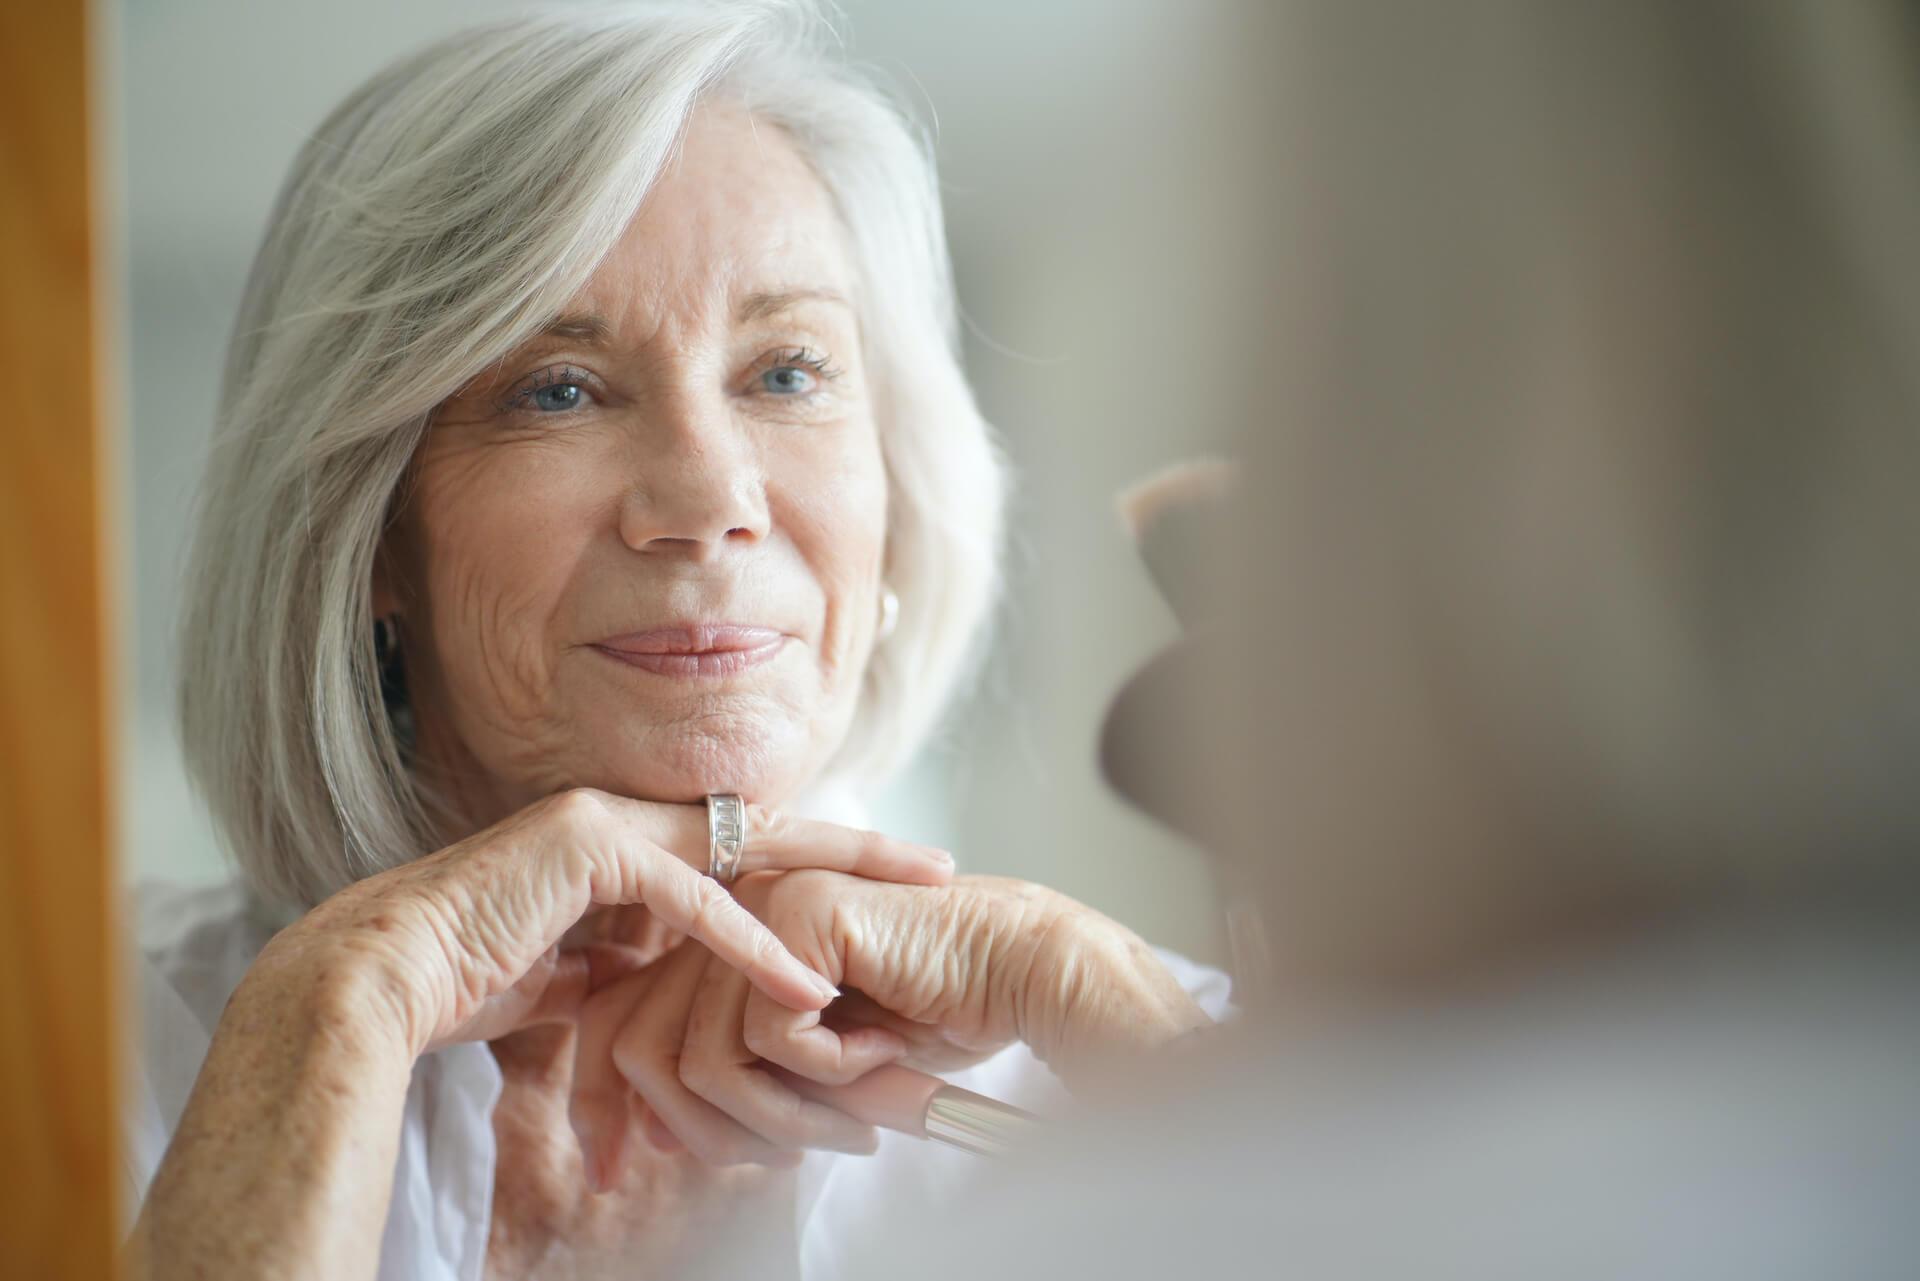 elder women looking at herself in a mirror